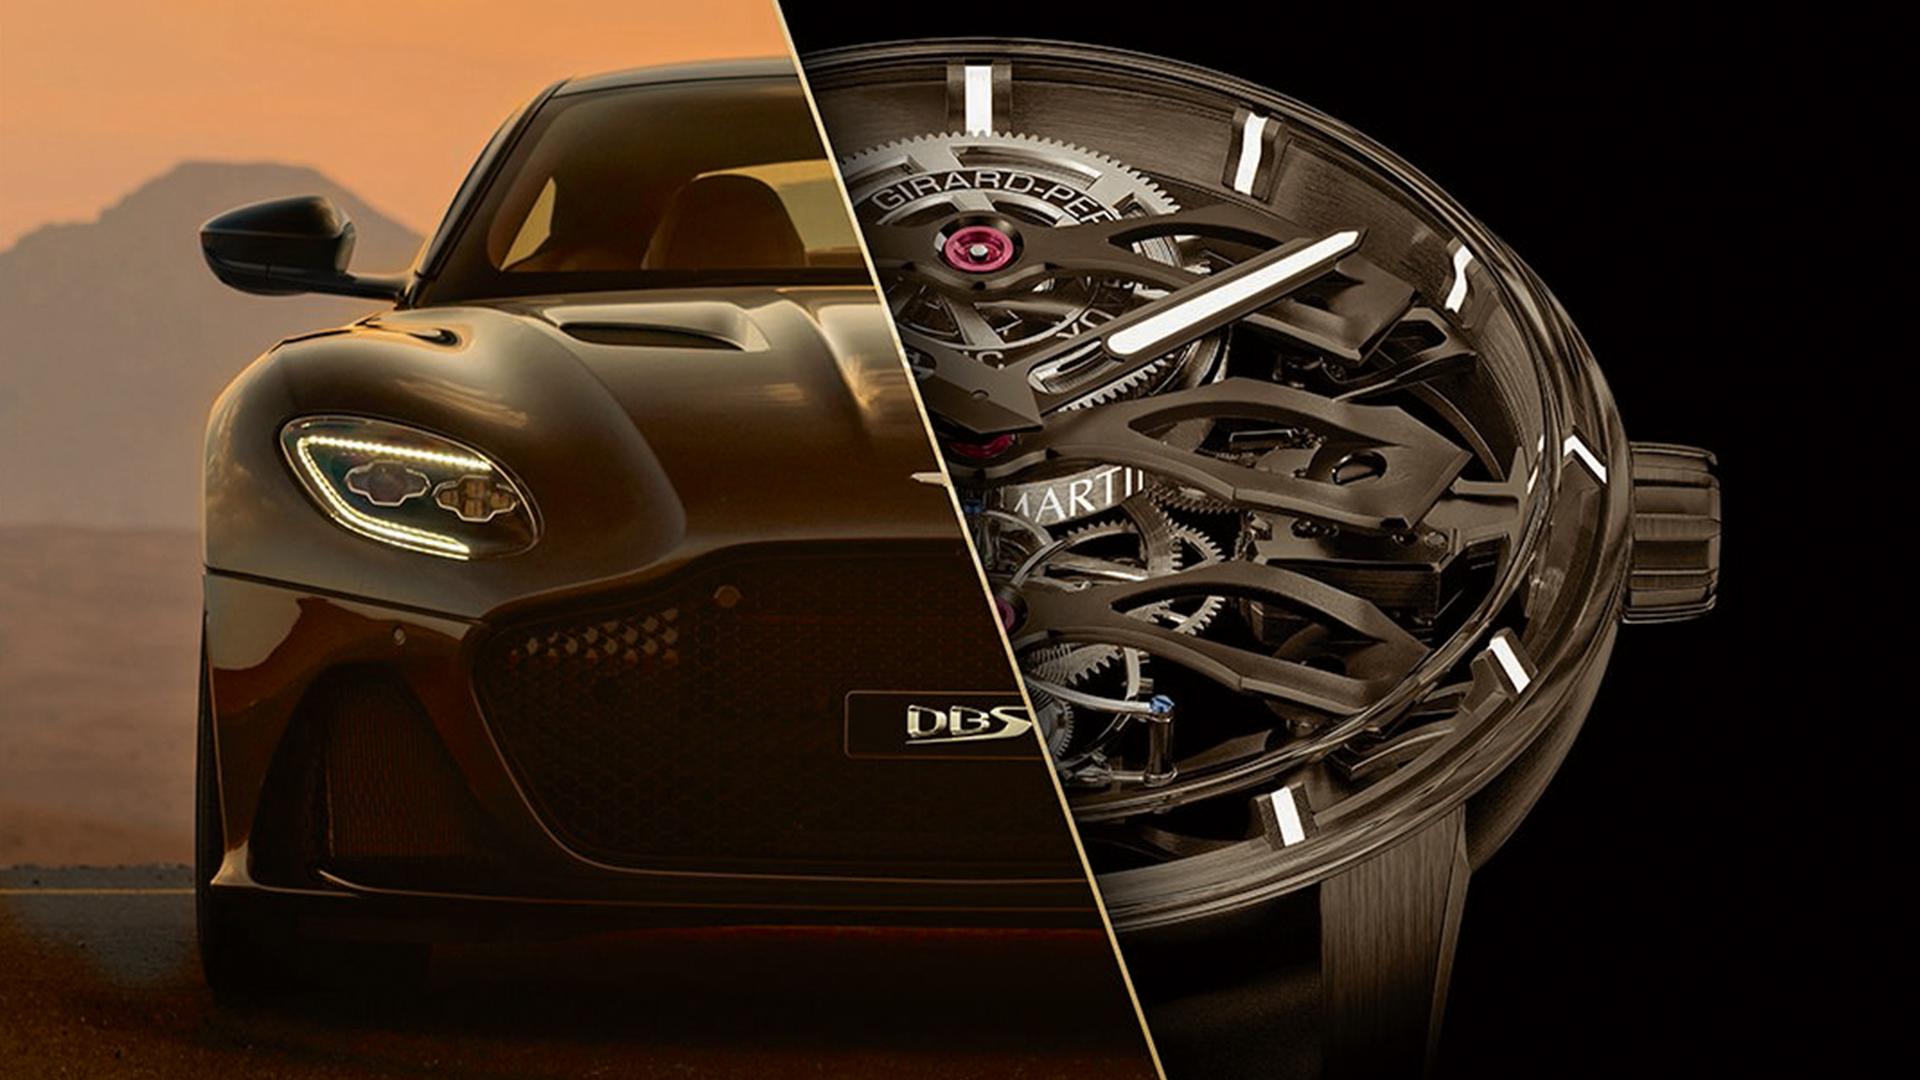 Aston-Martin-Girard-Perregaux